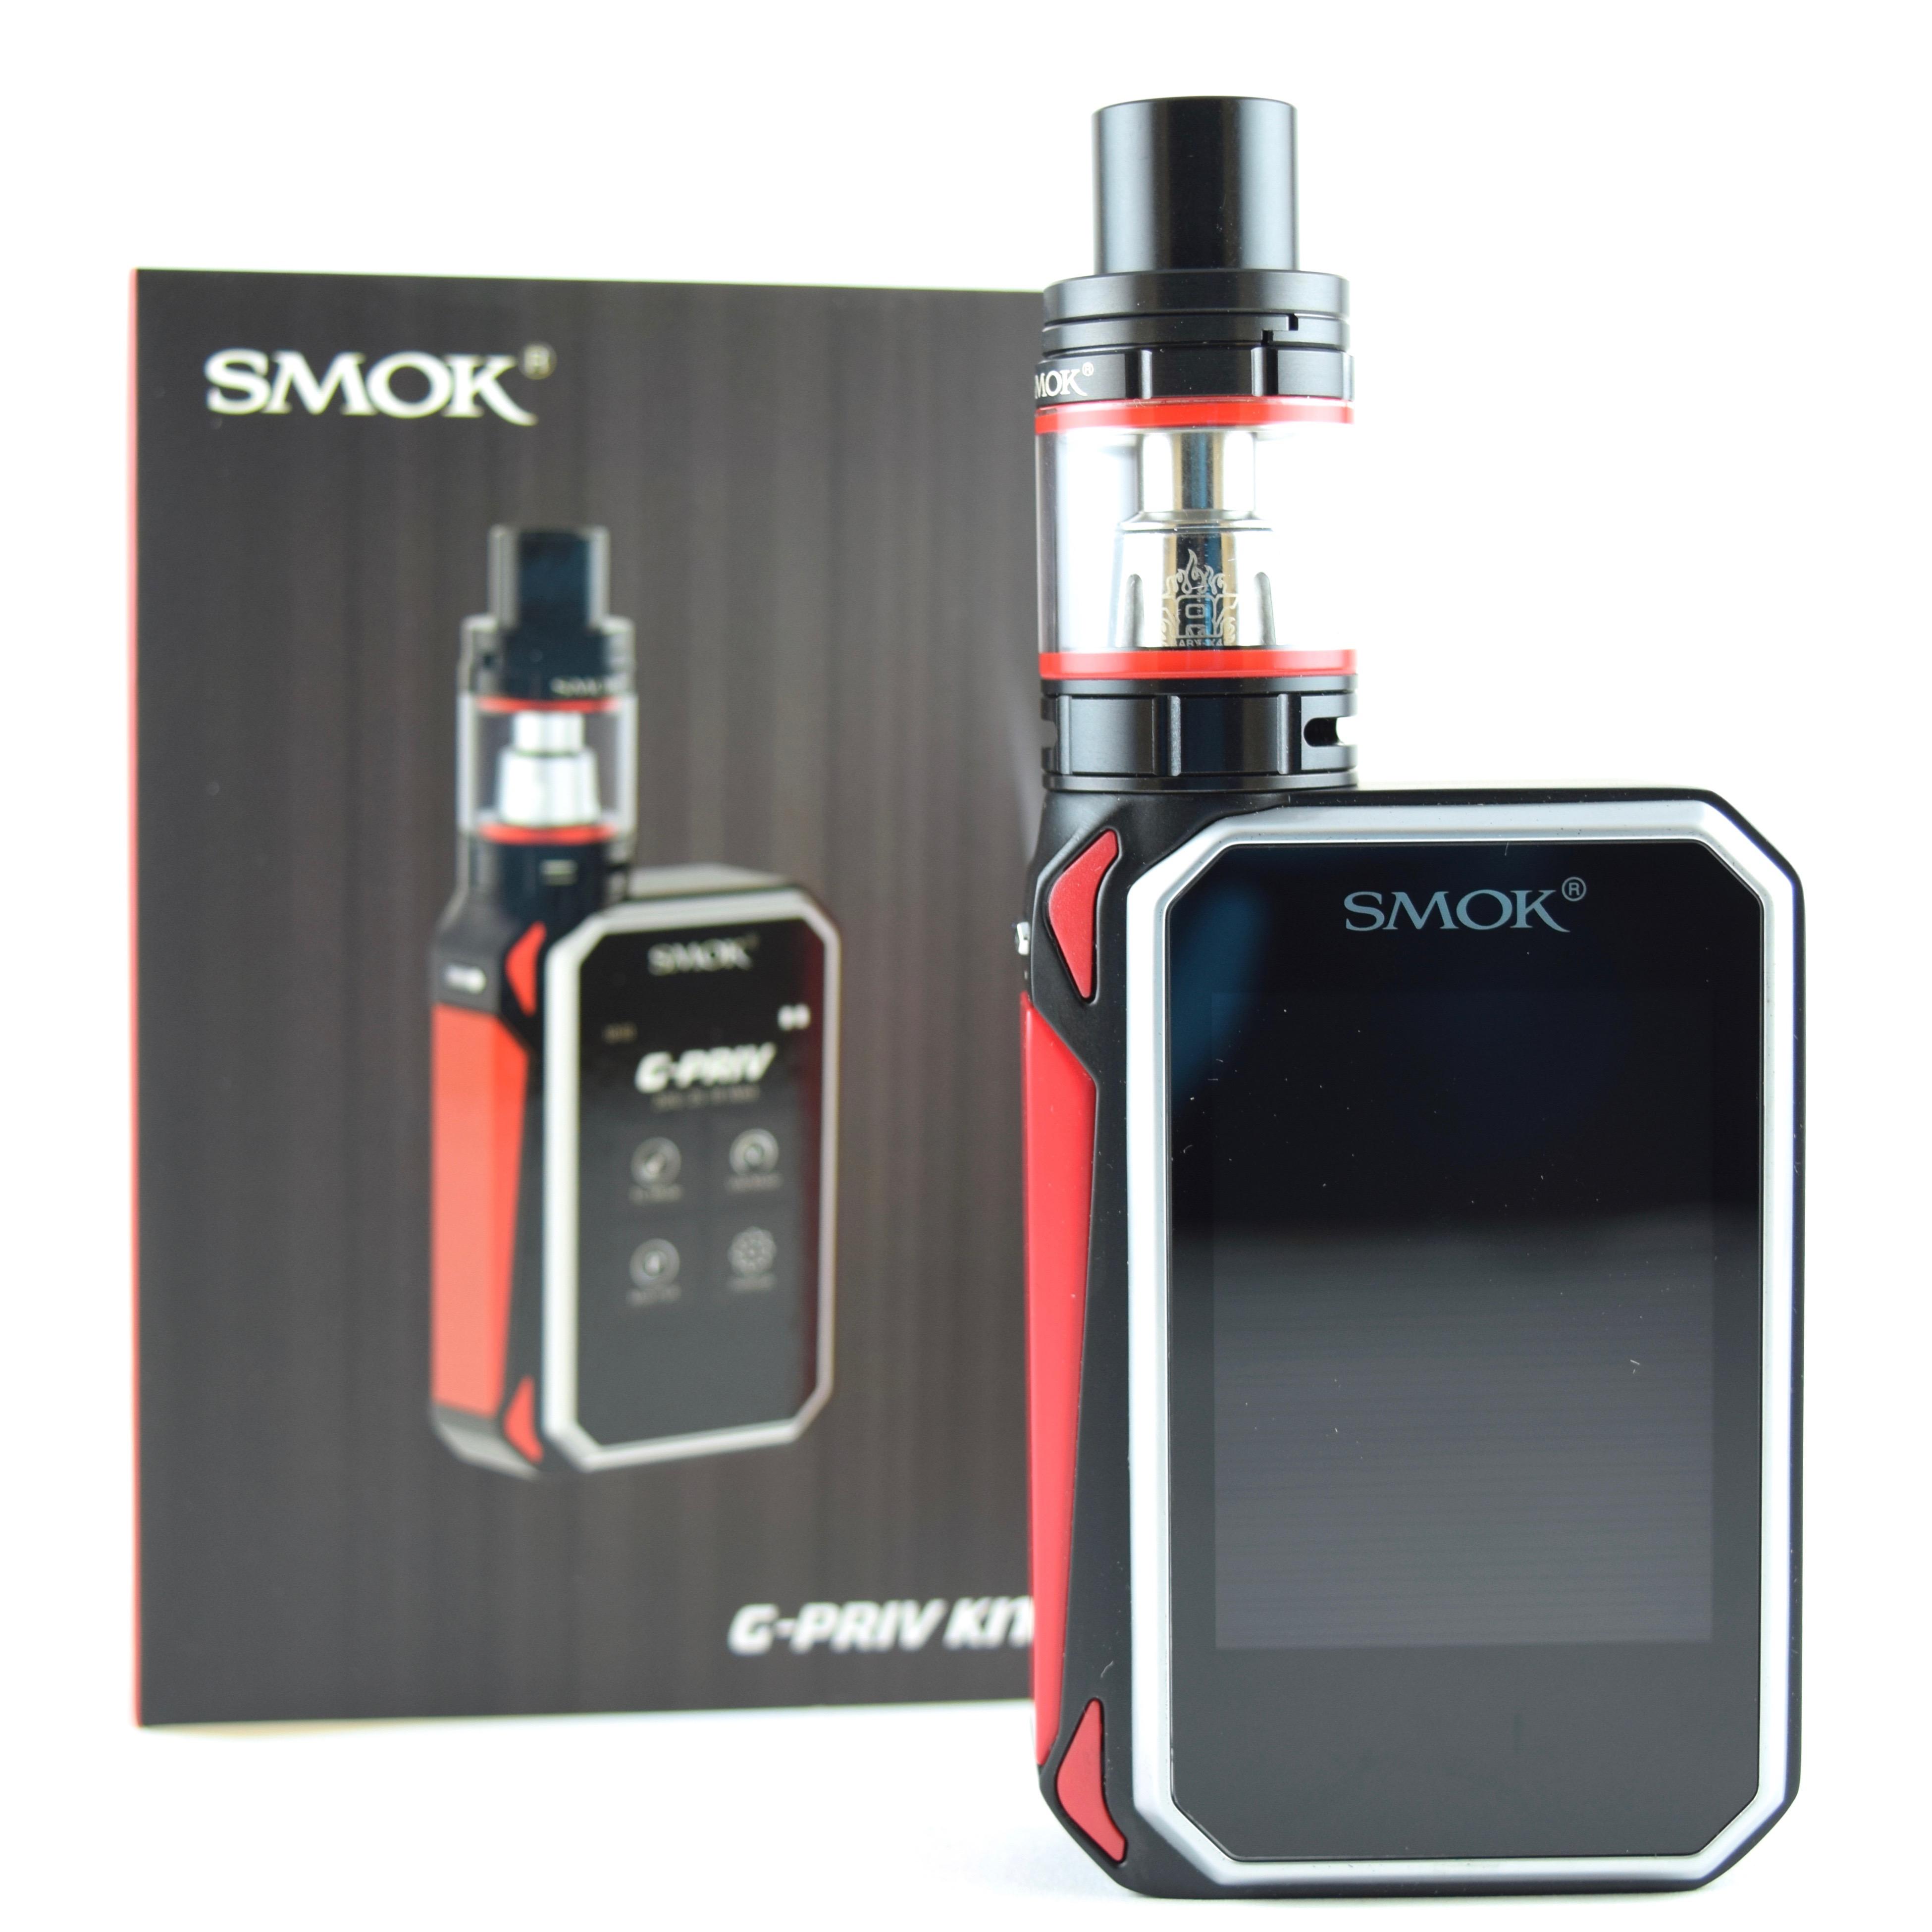 SMOK G-Priv 220W TC Starter Kit